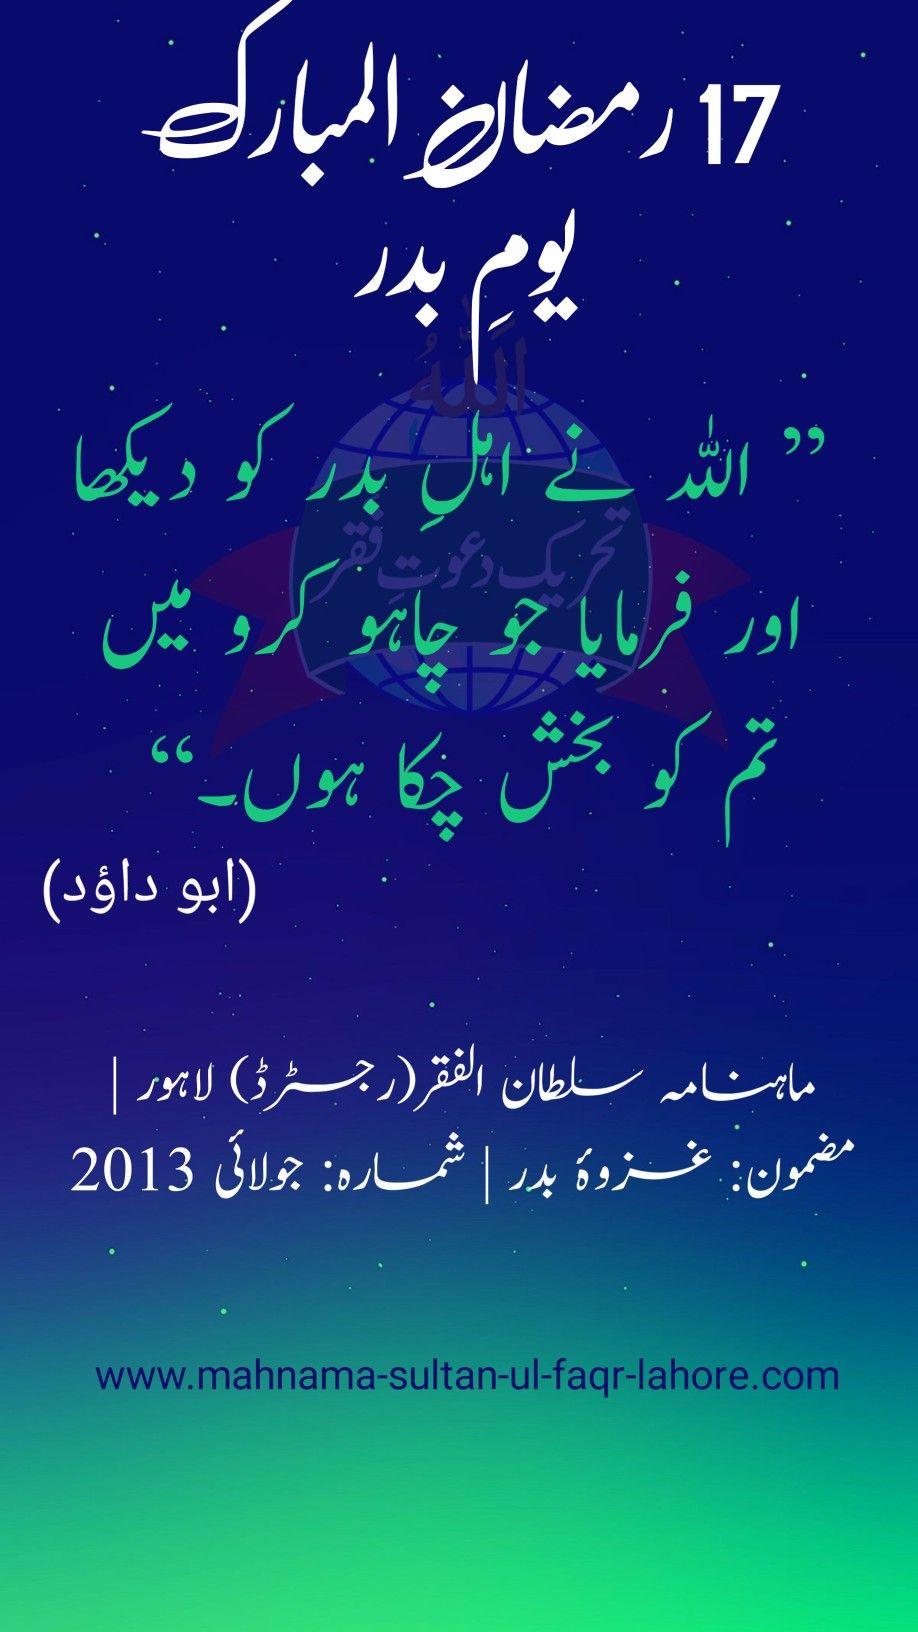 17th Ramadan Battle Of Badr Ramadan Ramadan Kareem Ramadhan